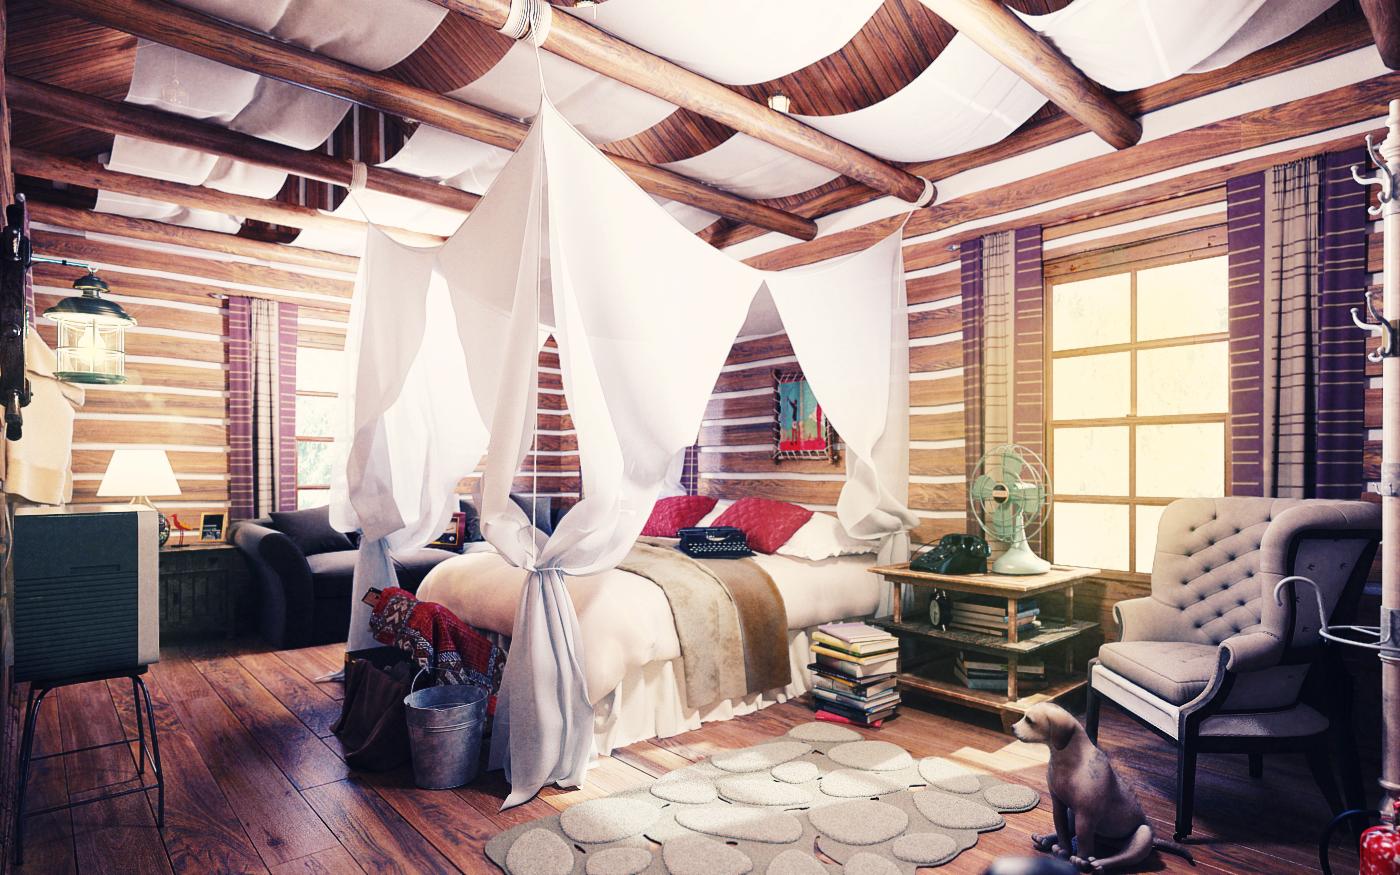 interior.bedroom.02.01 by pitposum